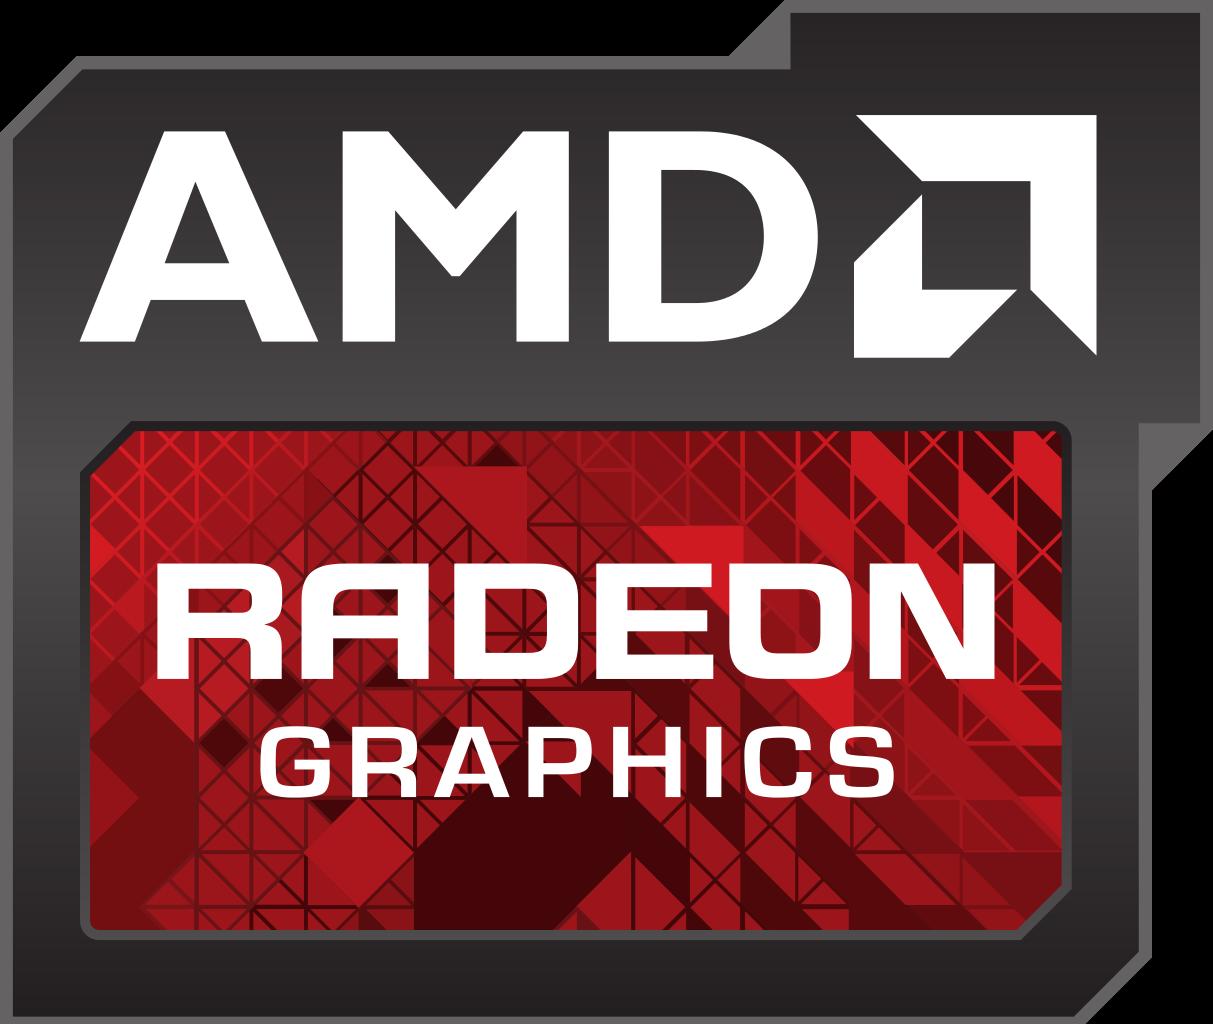 Drawn amd logo With Crimson svg performance